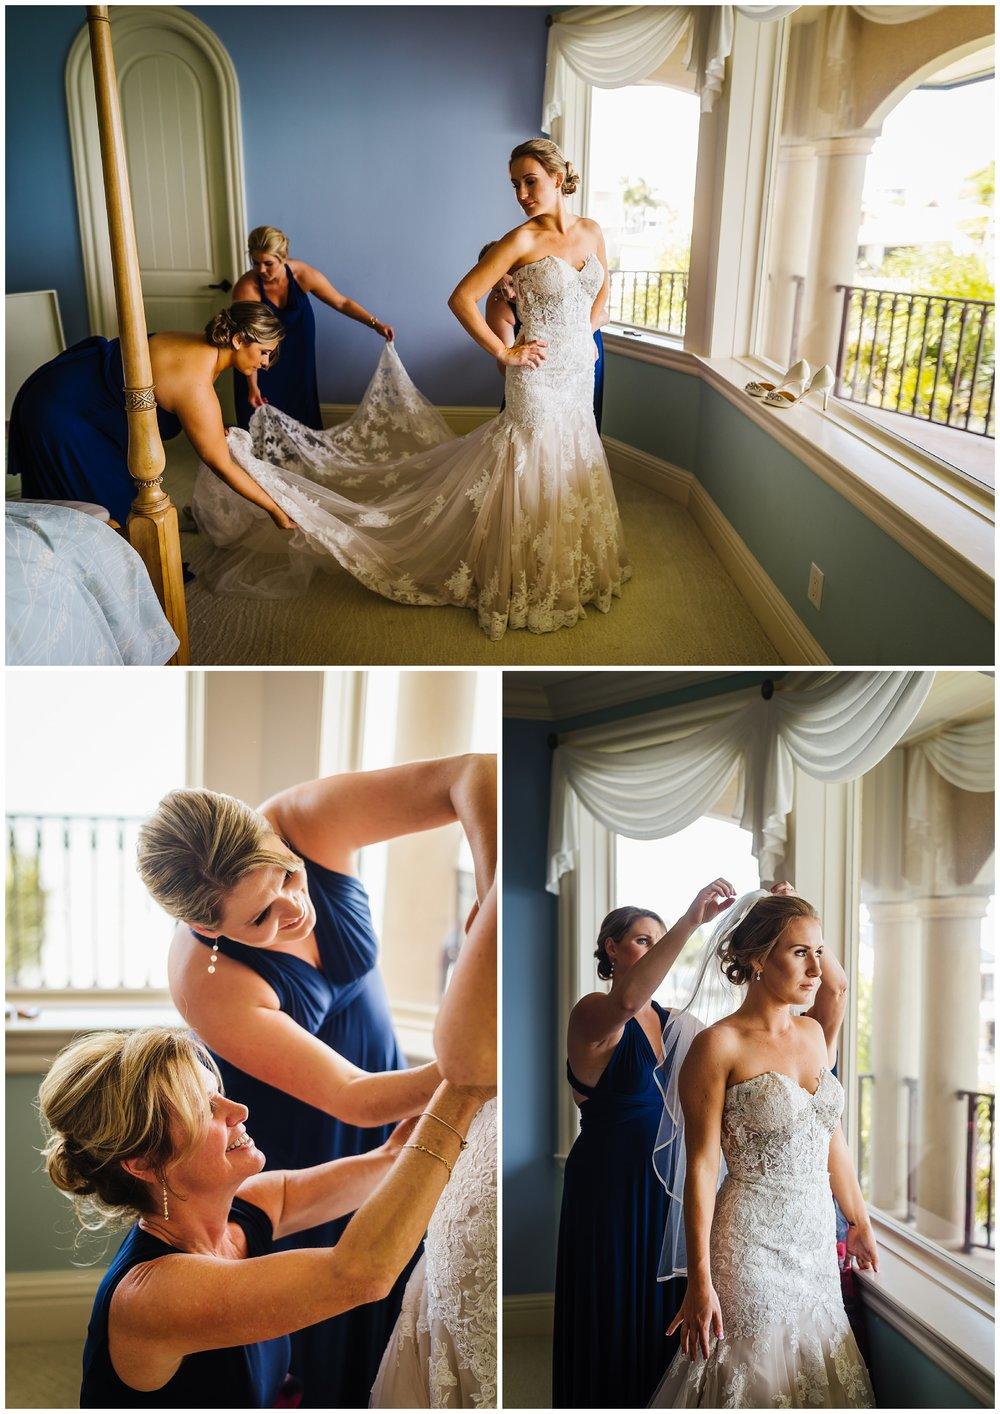 Tampa-wedding-photographer-bella-fleur-orchid-boquet-rsvb-events_0003.jpg